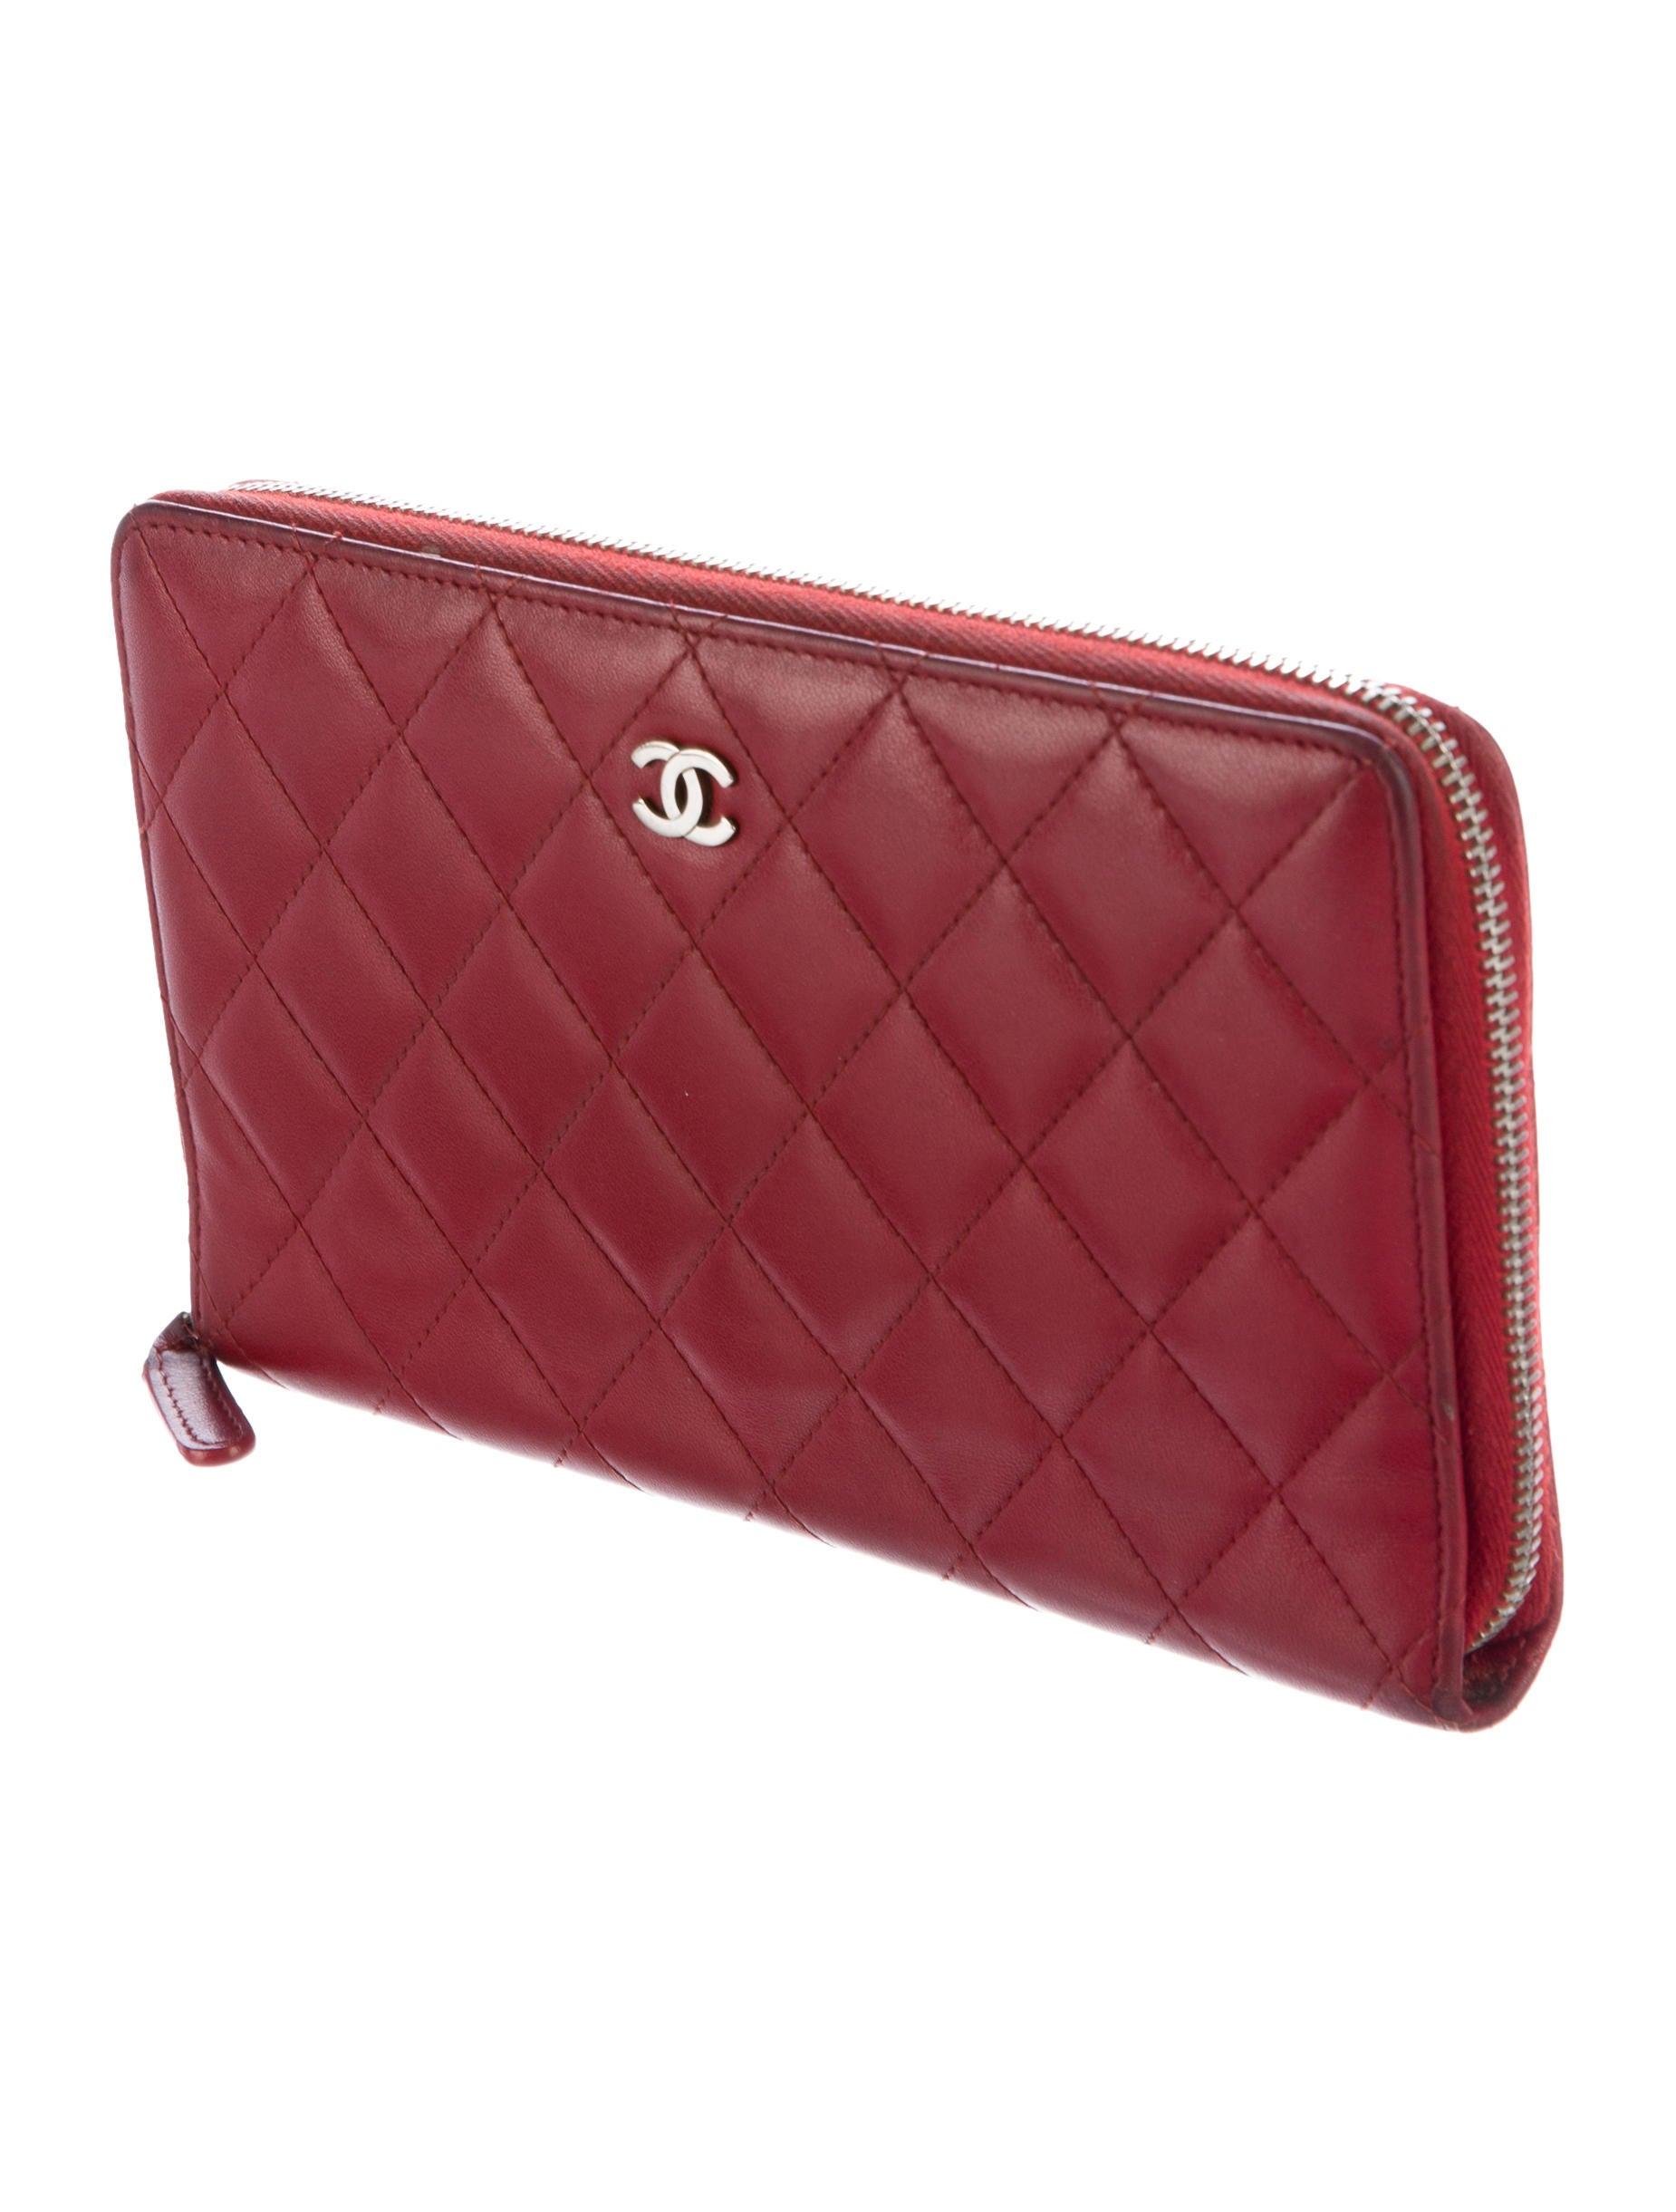 Chanel Lambskin Quilted Organizer Wallet Accessories